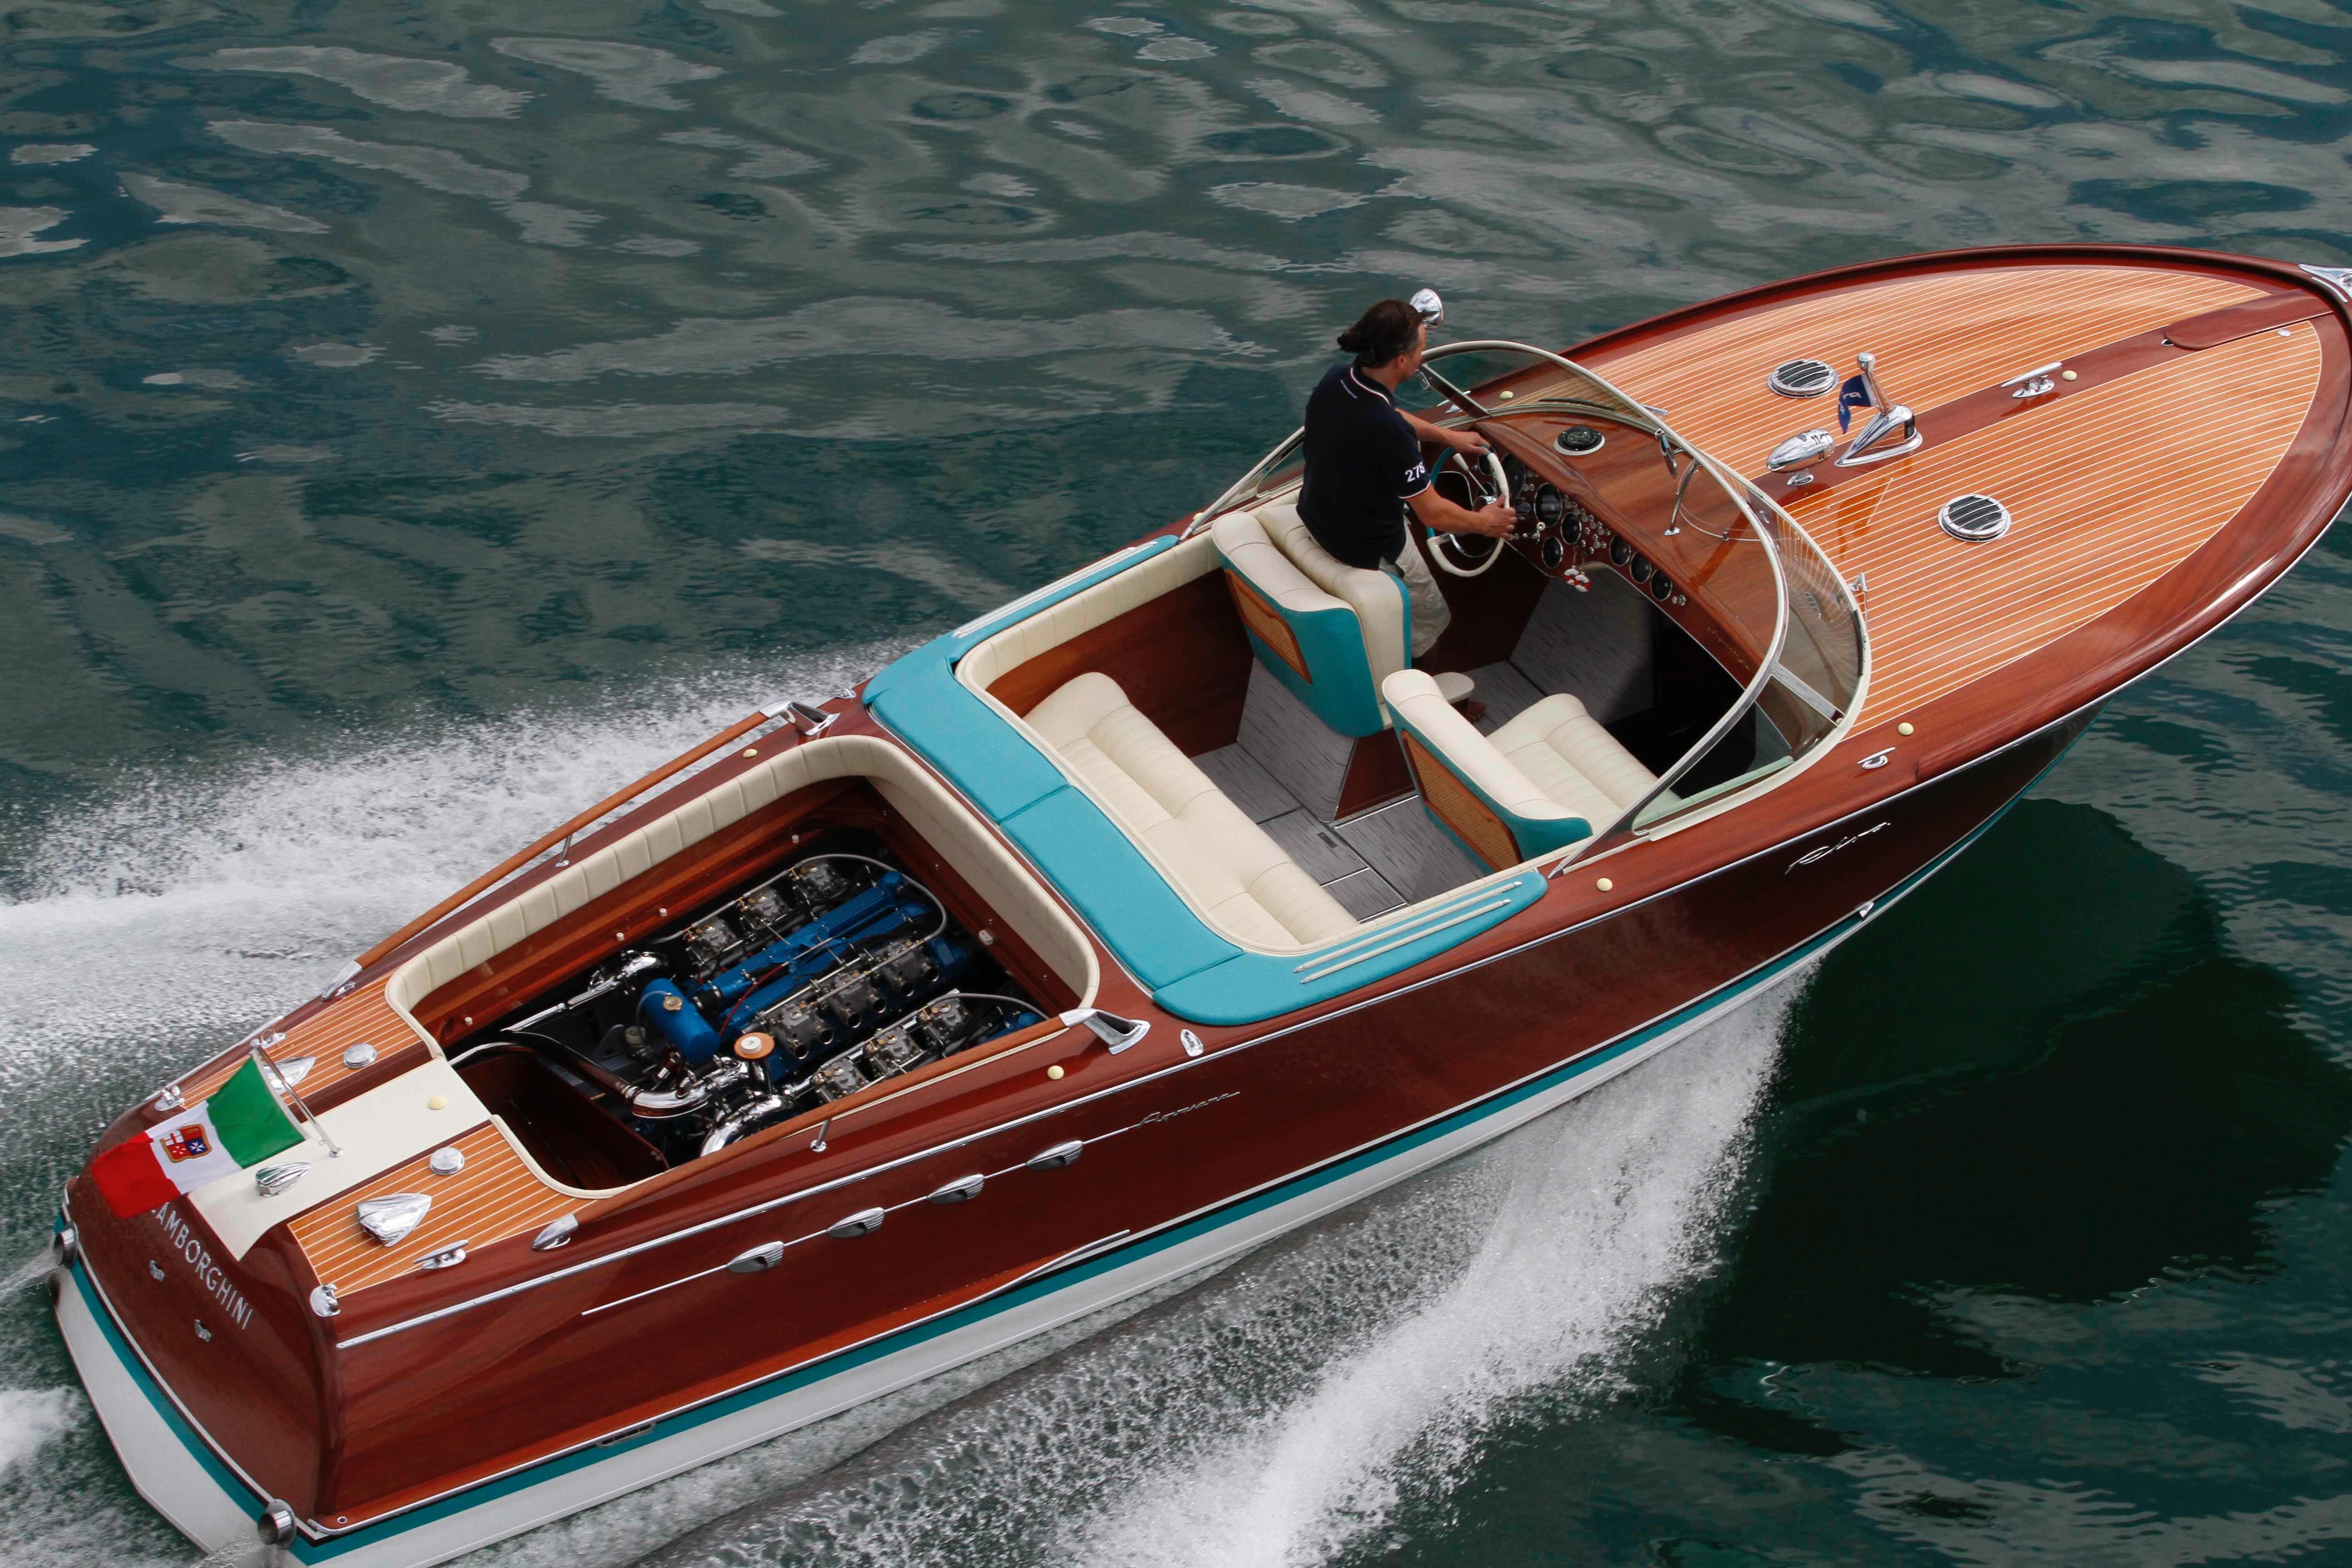 1968 Riva Aquarama Lamborghini Power Boat For Sale Www